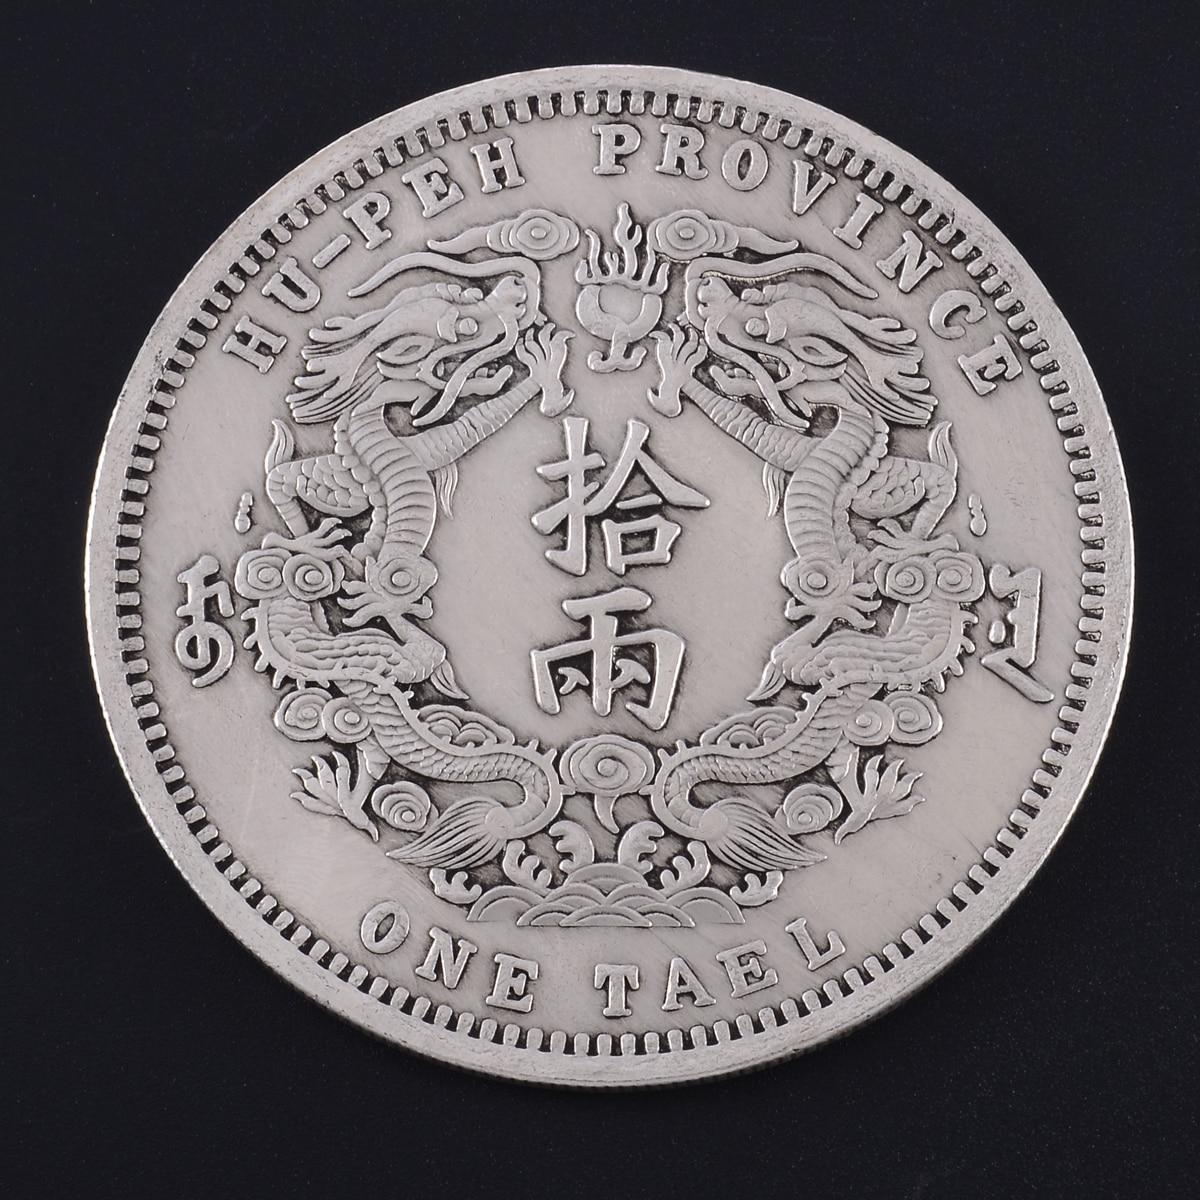 Rare Tibetan silver China Handwork Da Qing dynasty dragon commemorative coins